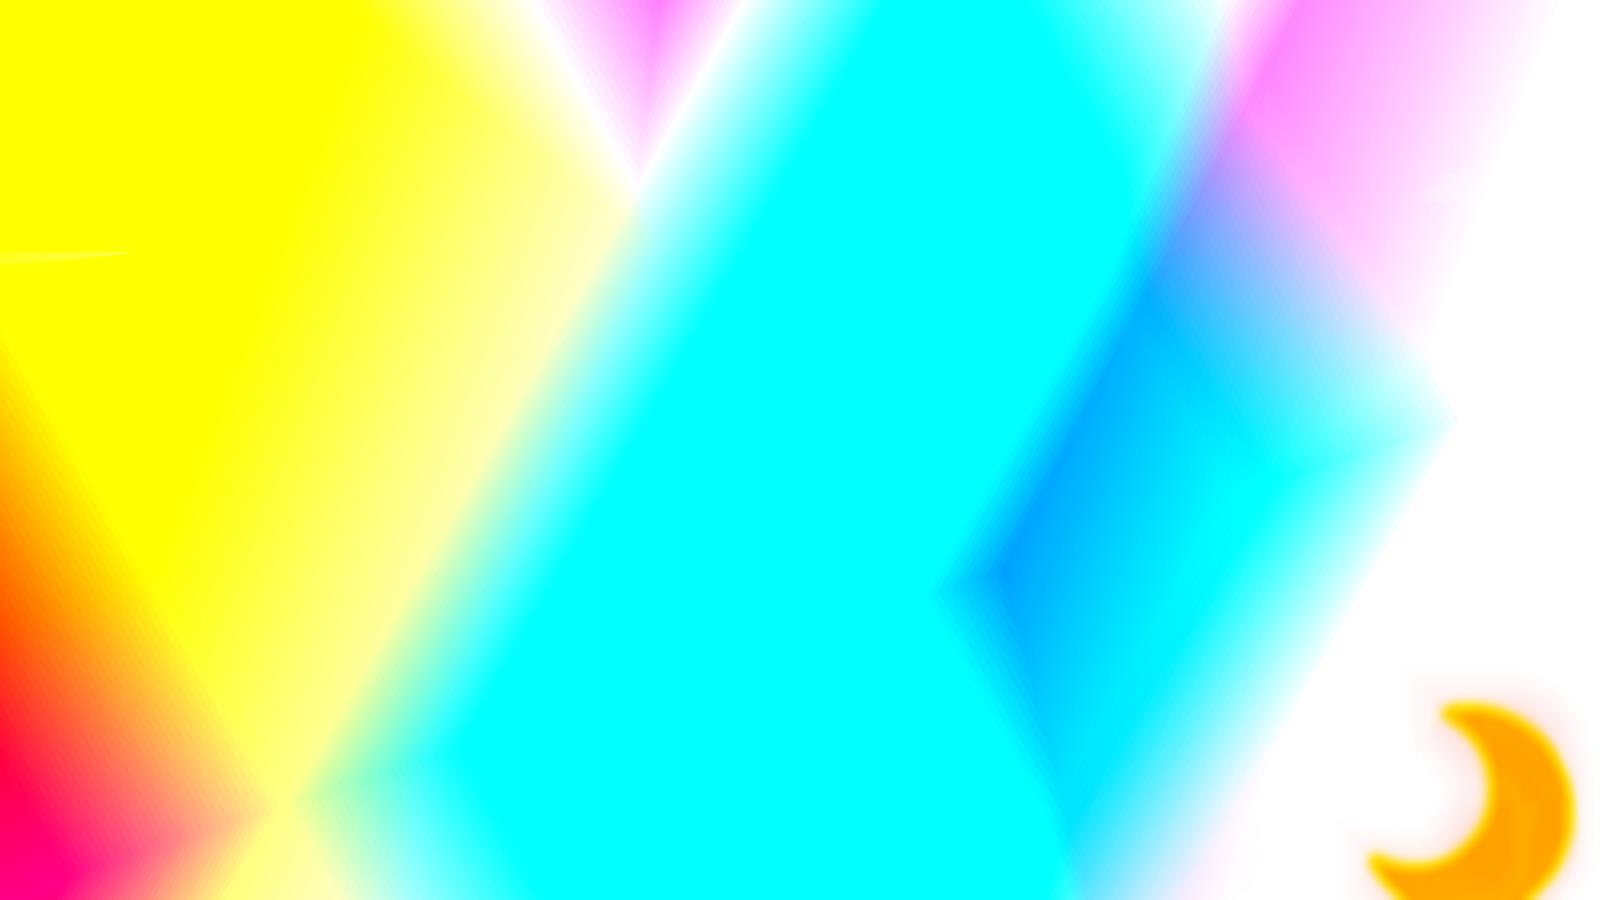 Bright color background wallpaper   design   Pinterest   Bright ...